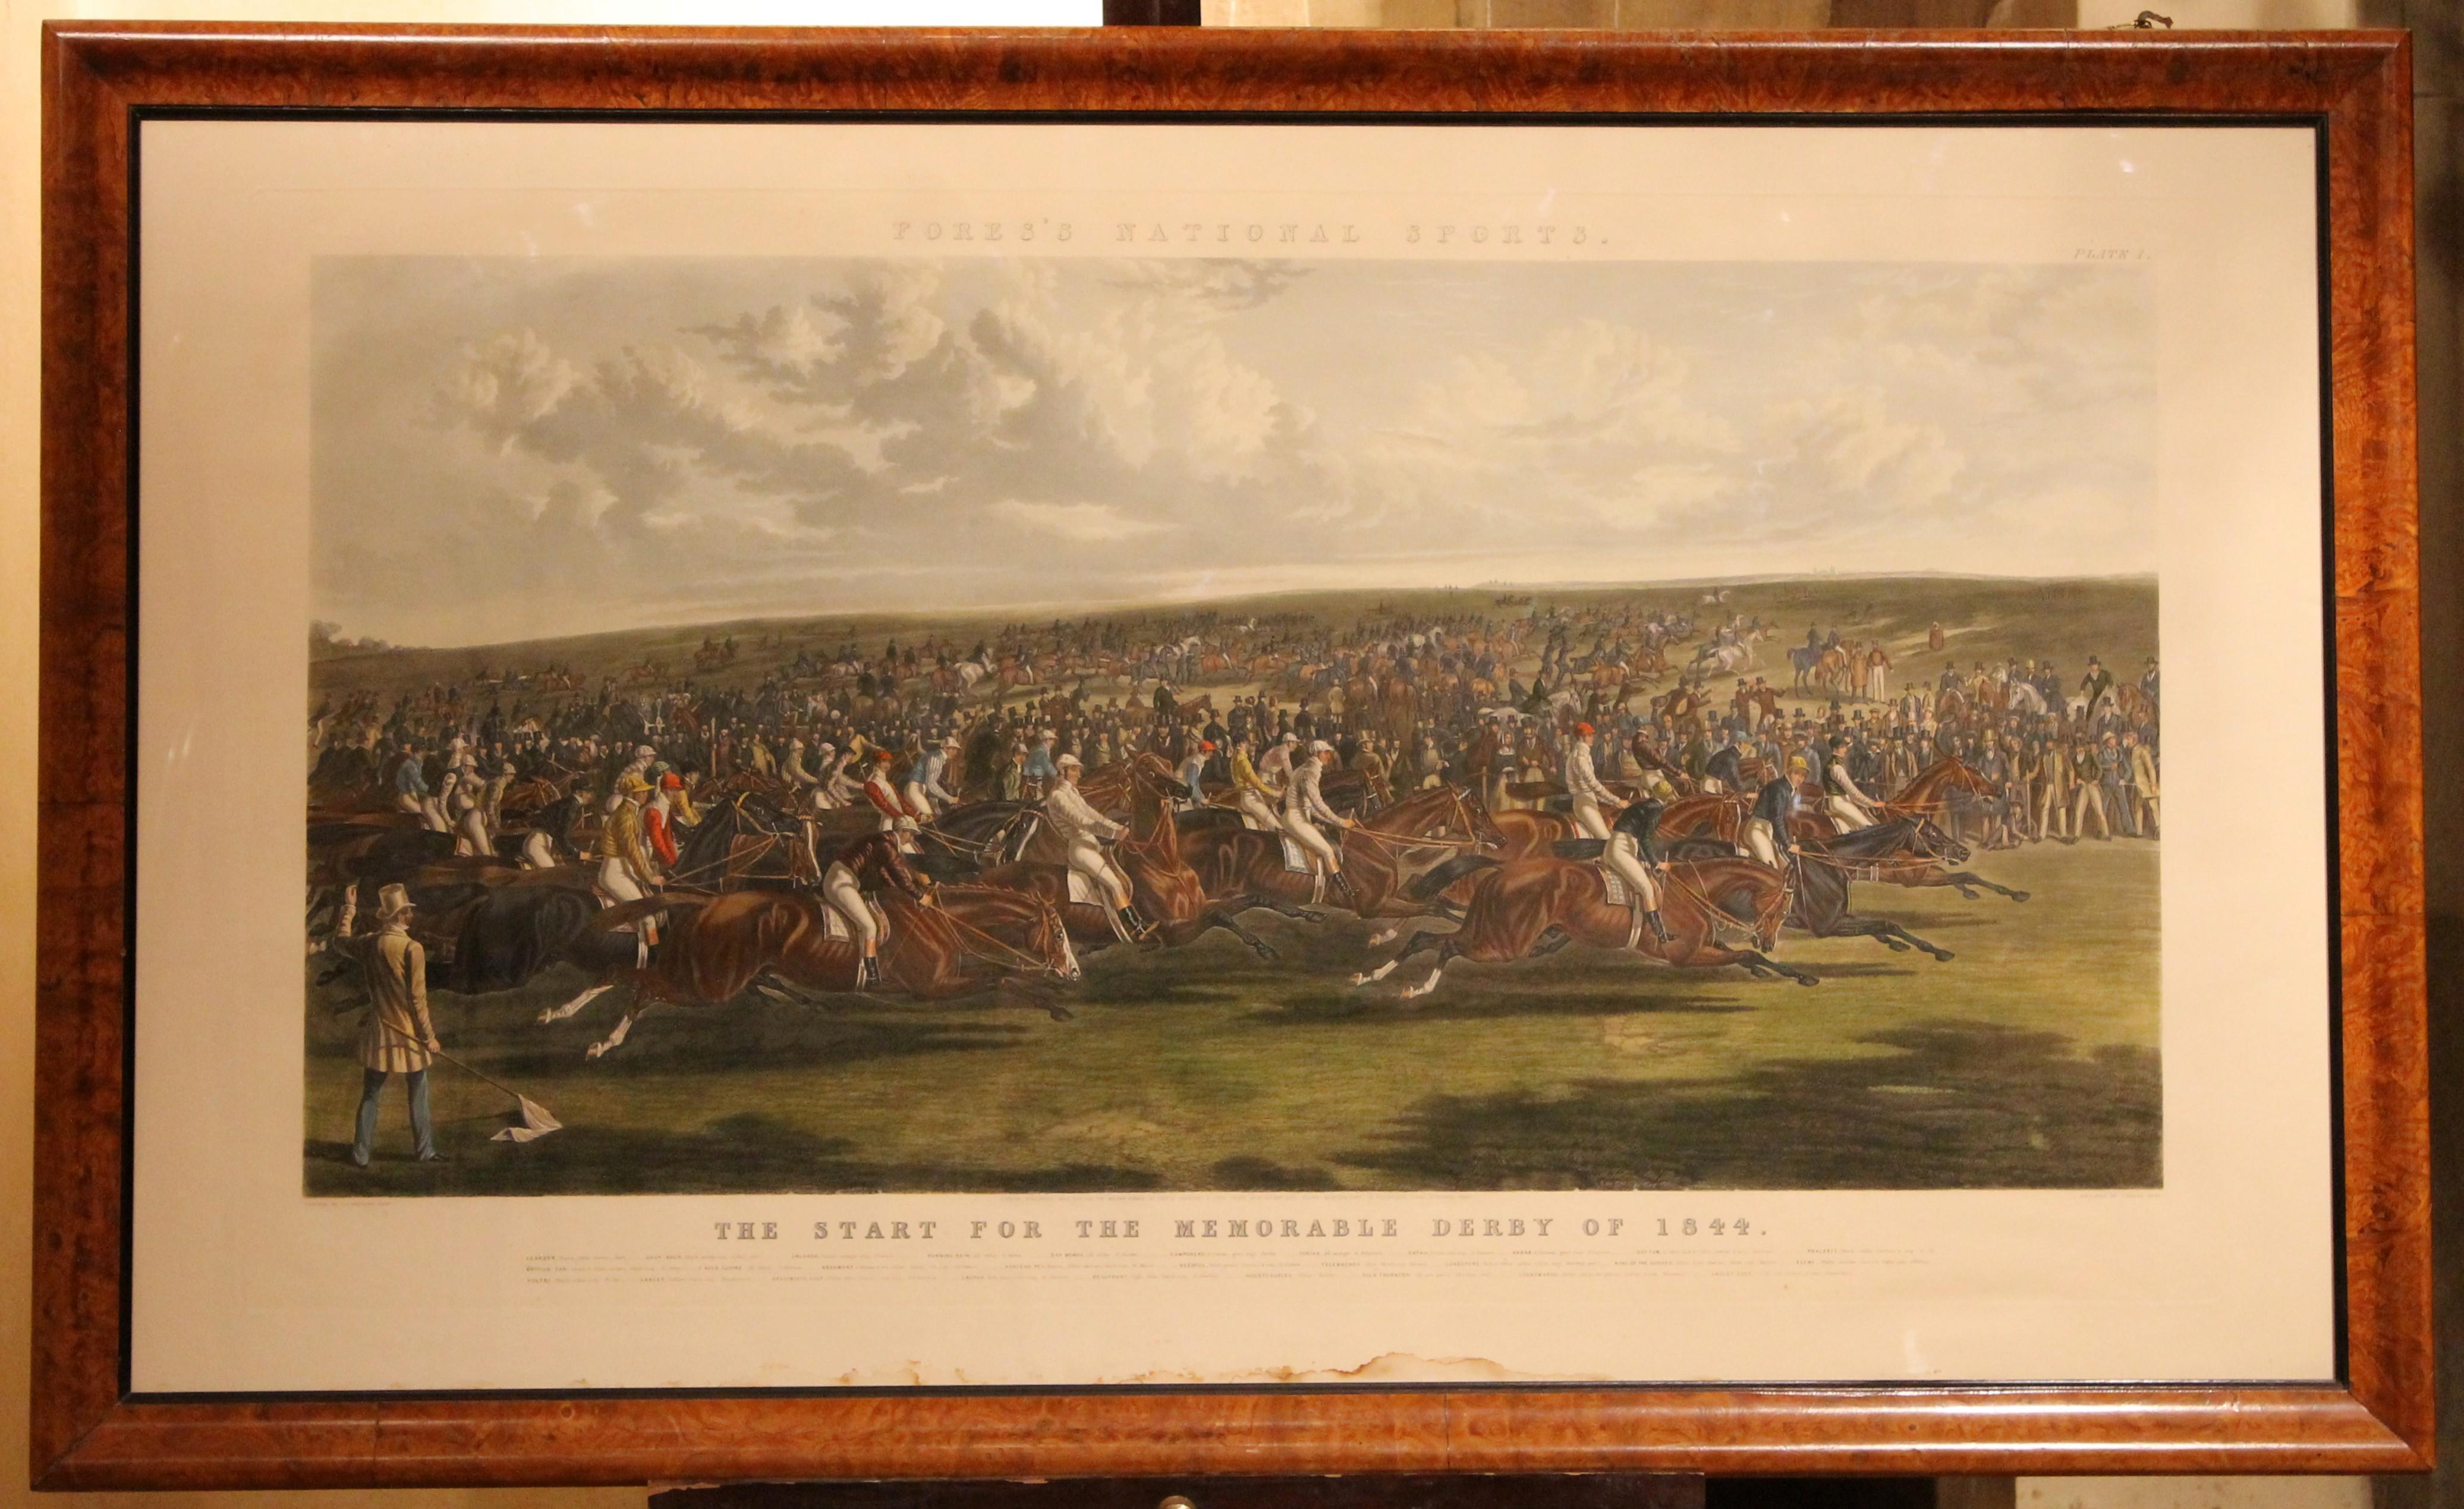 Antique English Hand Colored Engraving Equestrian Landscape Scene in Burl Frame